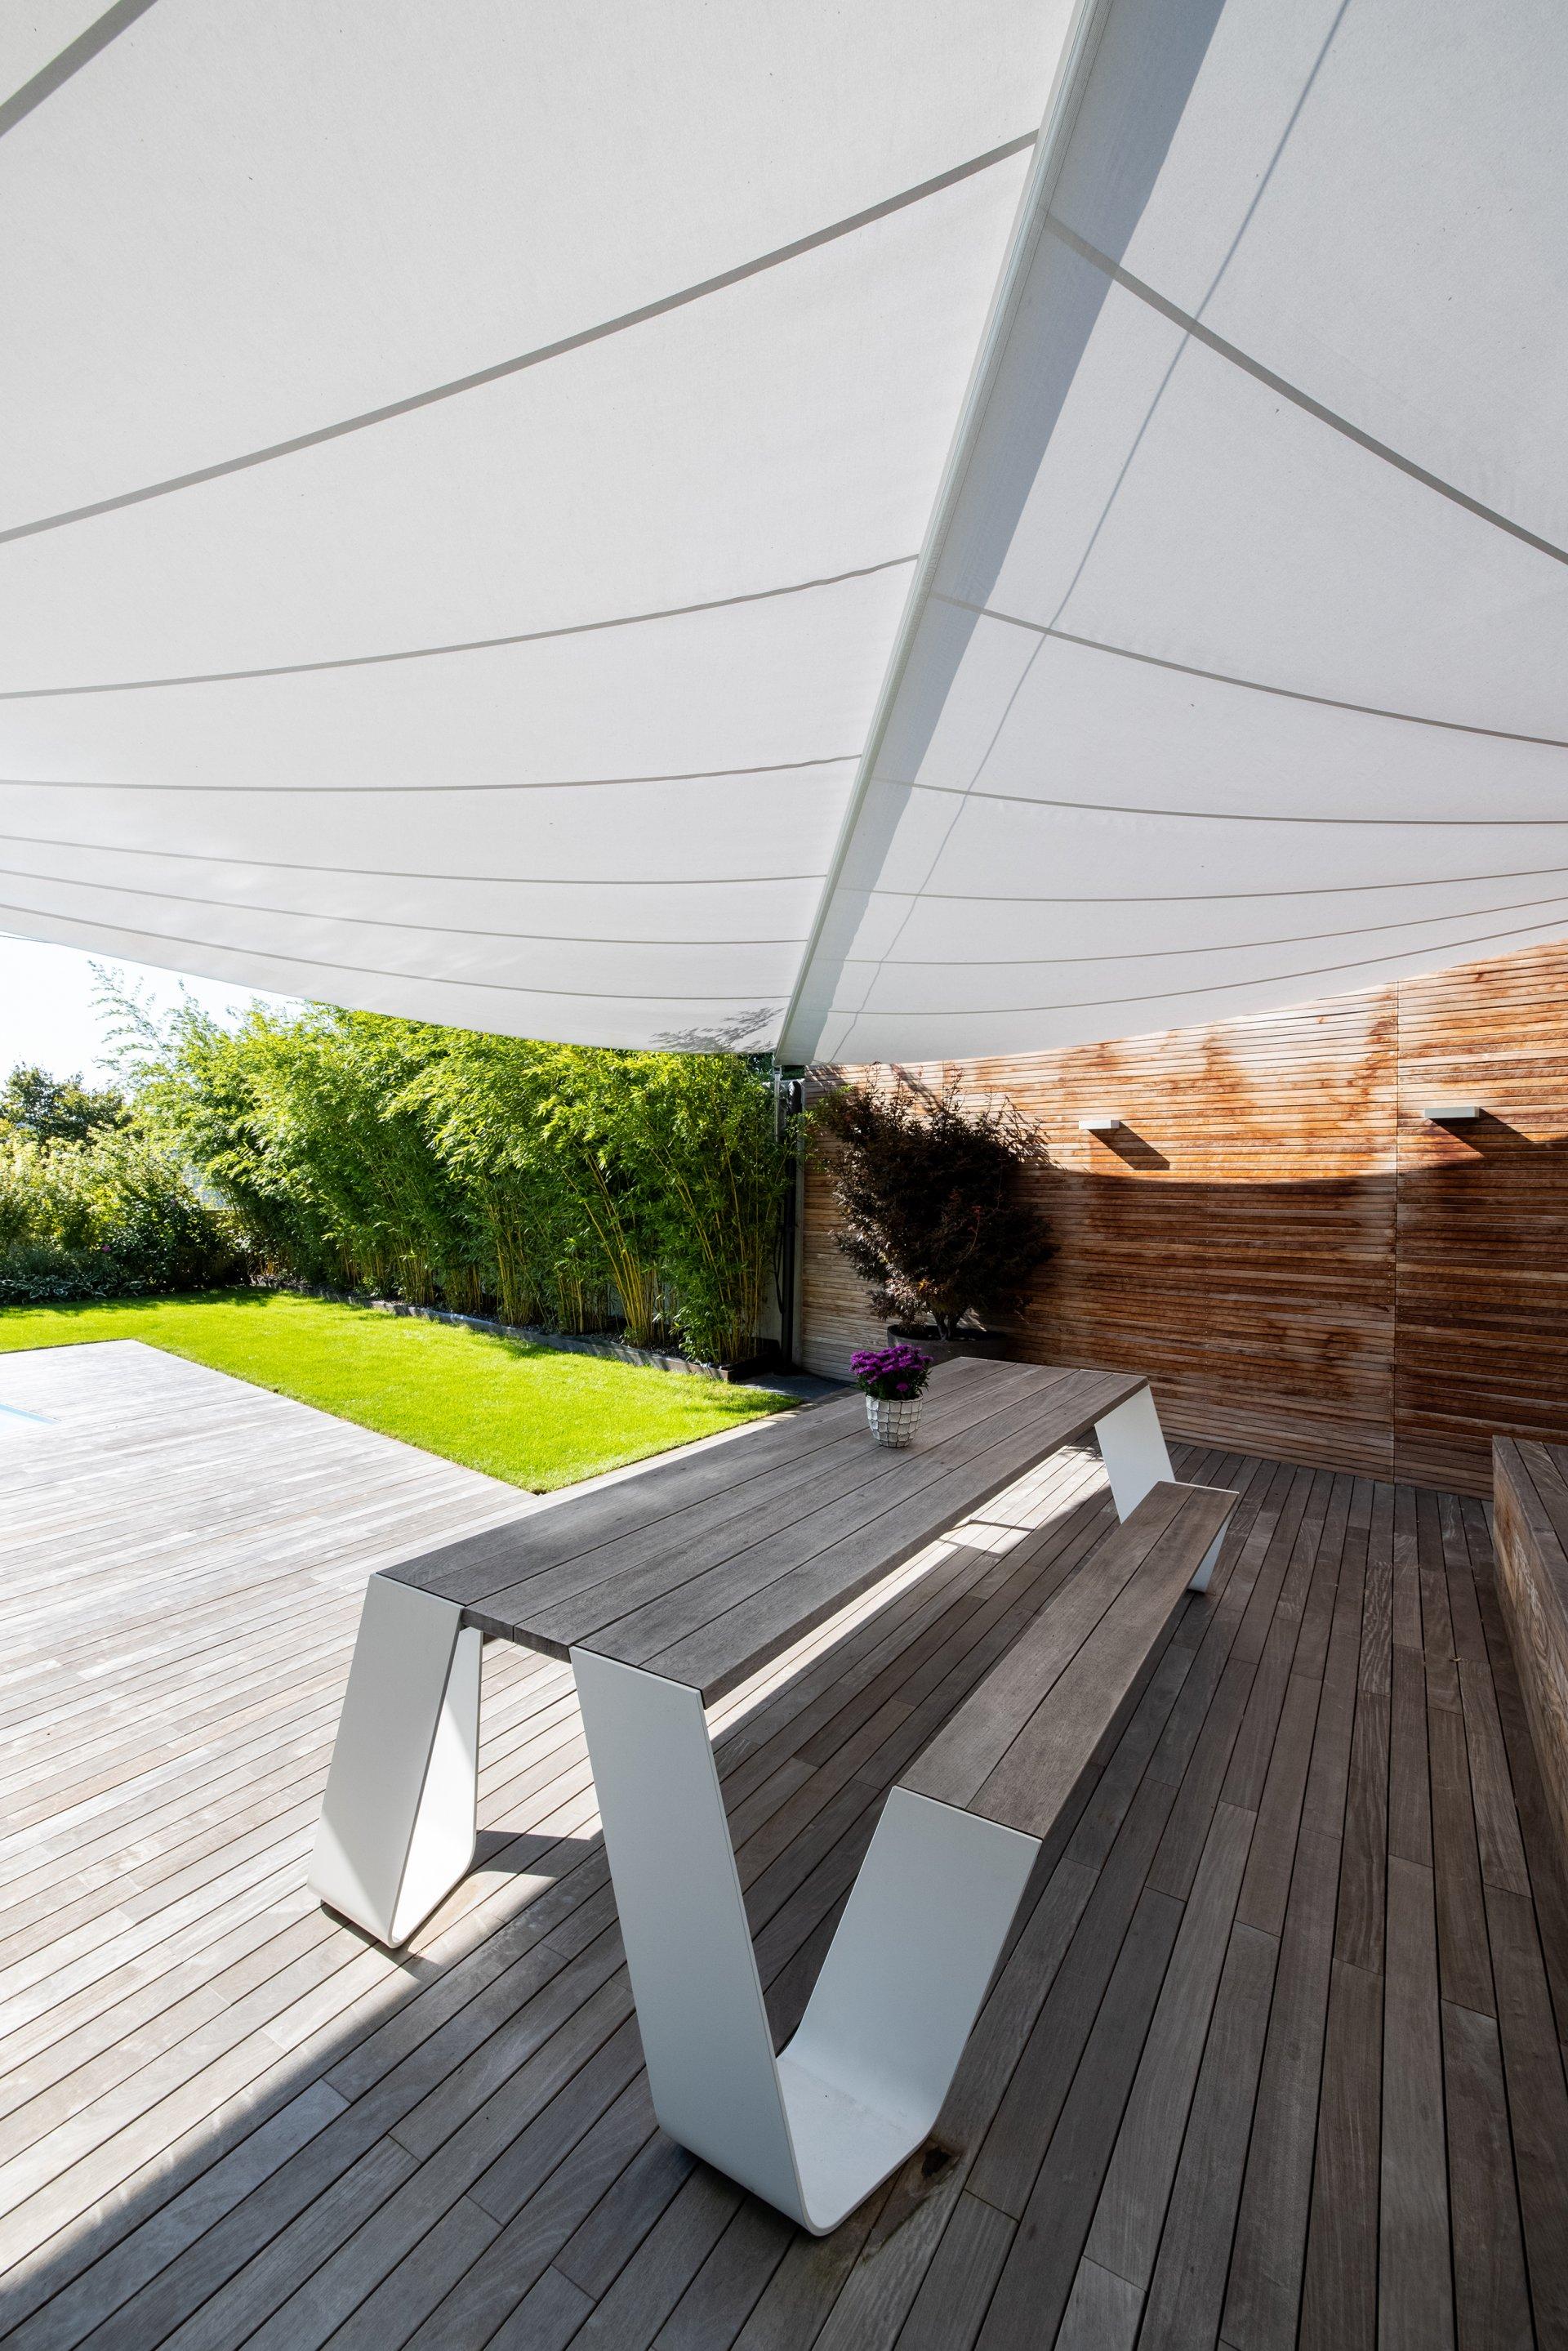 SunSquare Dreiecksegel: vollautomatisch